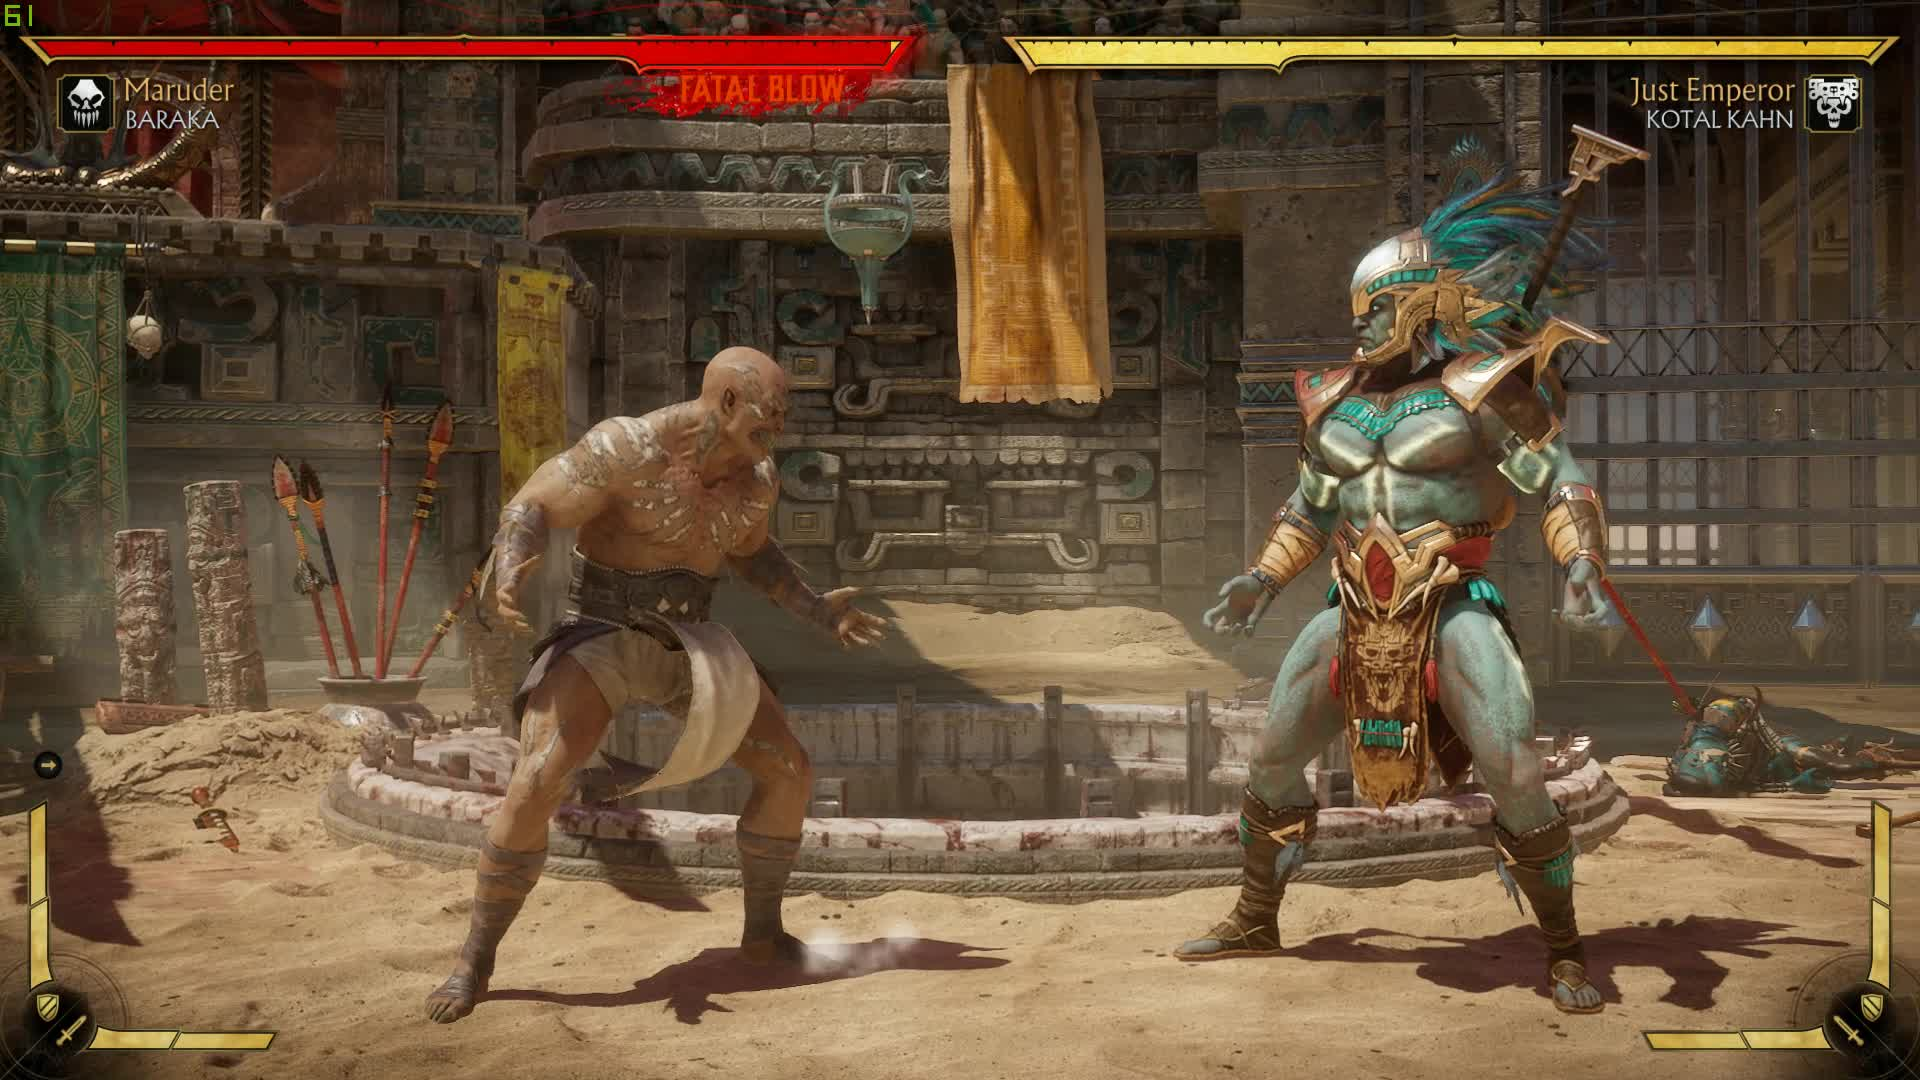 Mortal Kombat 11 Baraka Fatal Blow 60 FPS Test